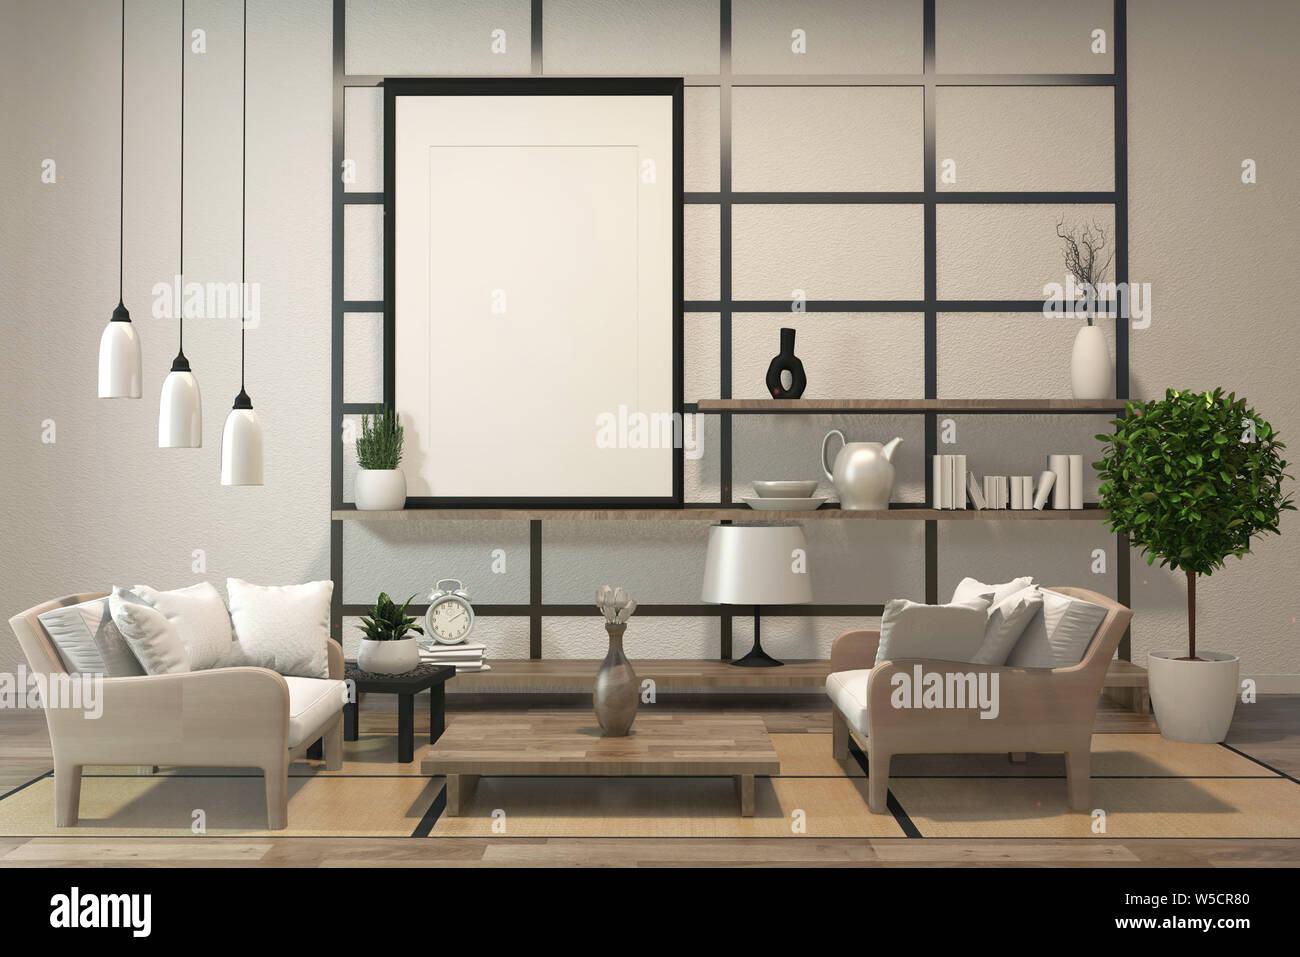 Minimalist modern zen living room with wood floor and decor